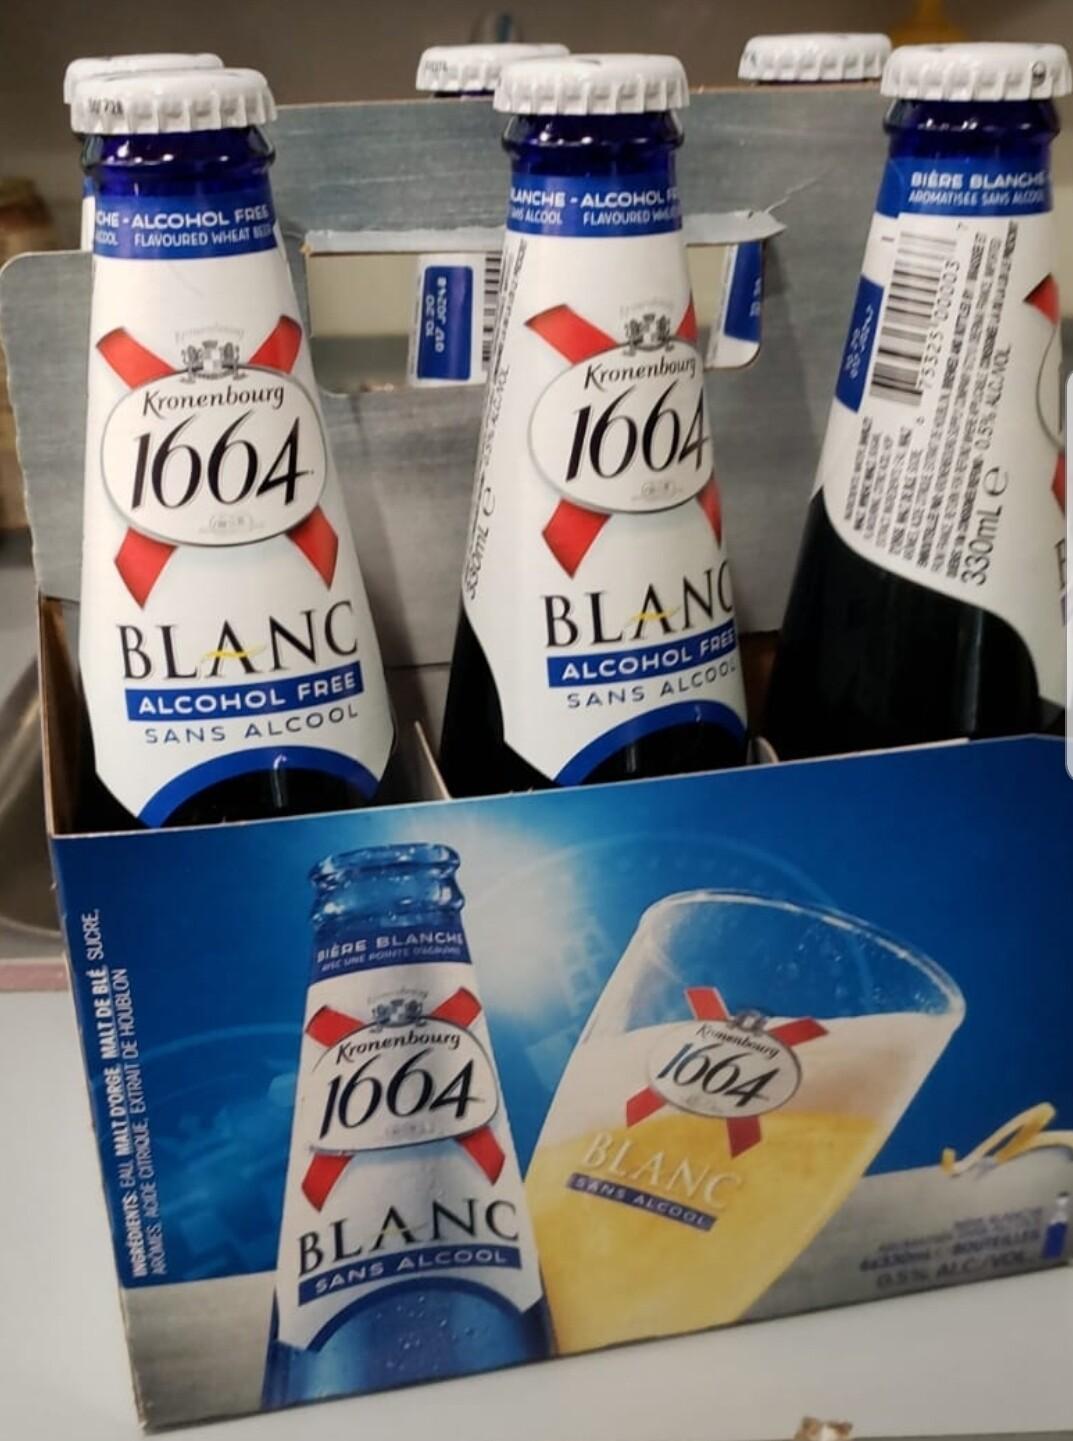 1664 Blanche sans Alcool 13.99$